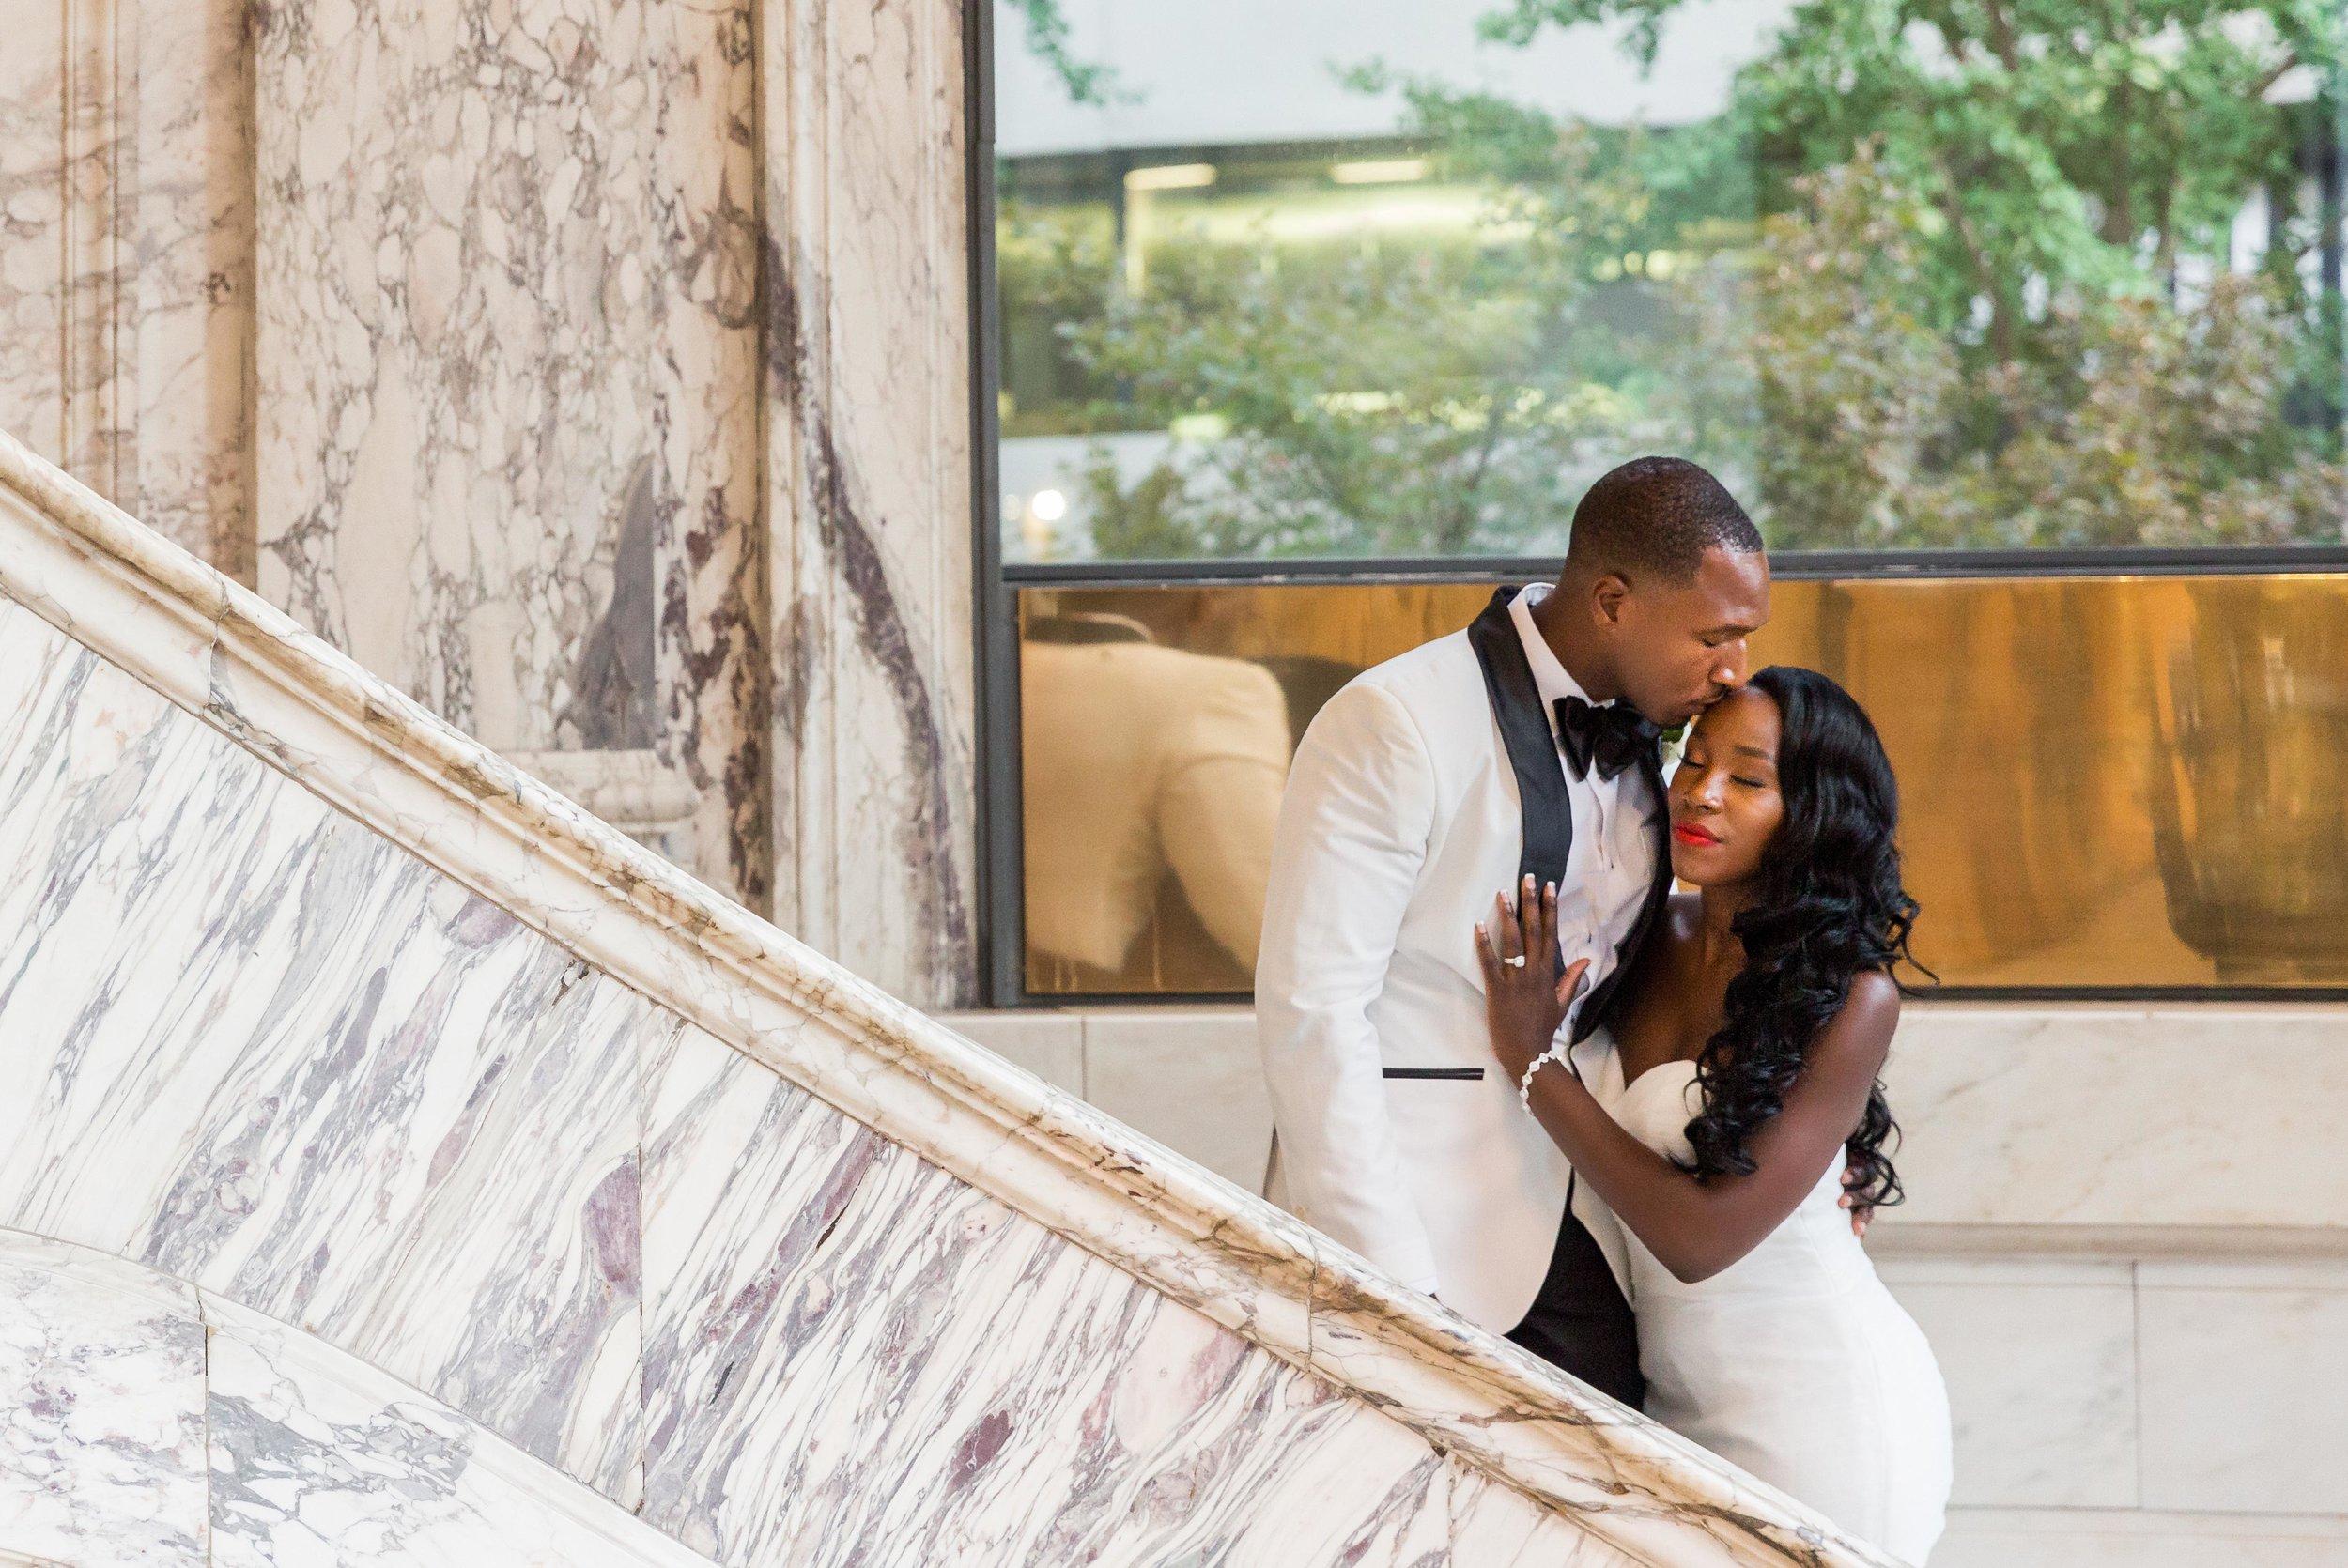 BITM_W18_Weddings_Feature_Tenesha_and_Justin-1.jpg